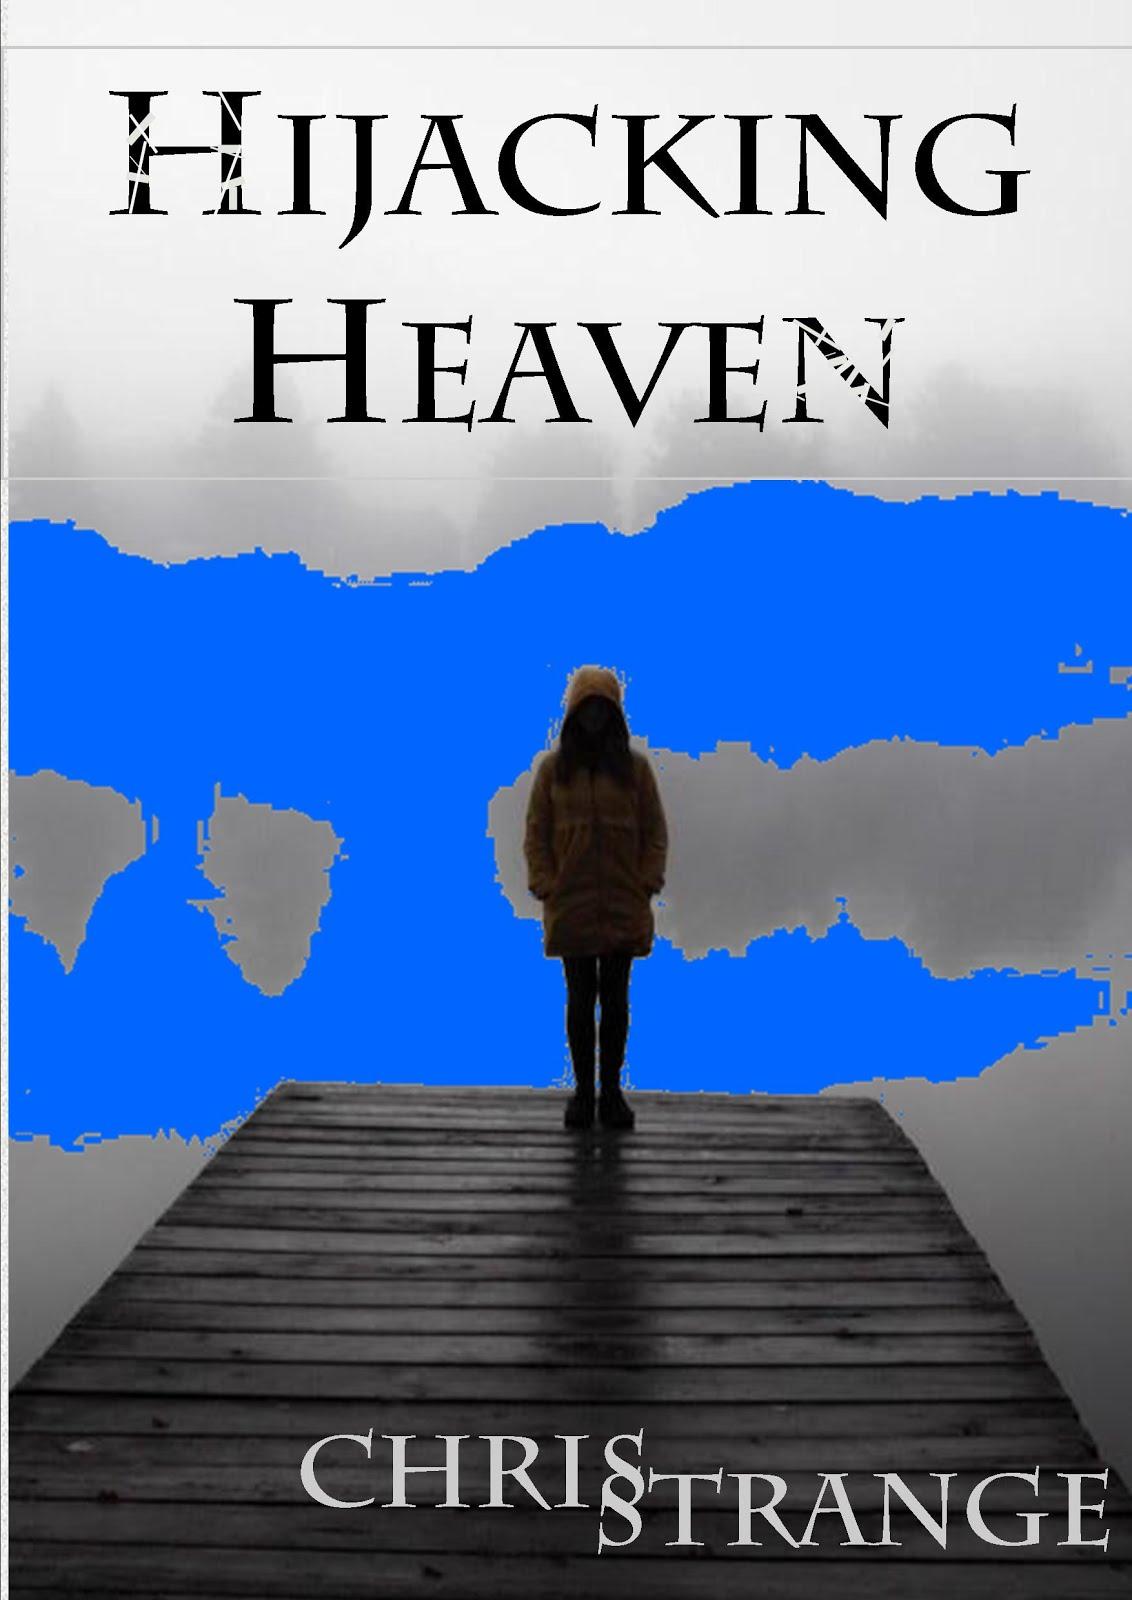 Hijacking Heaven